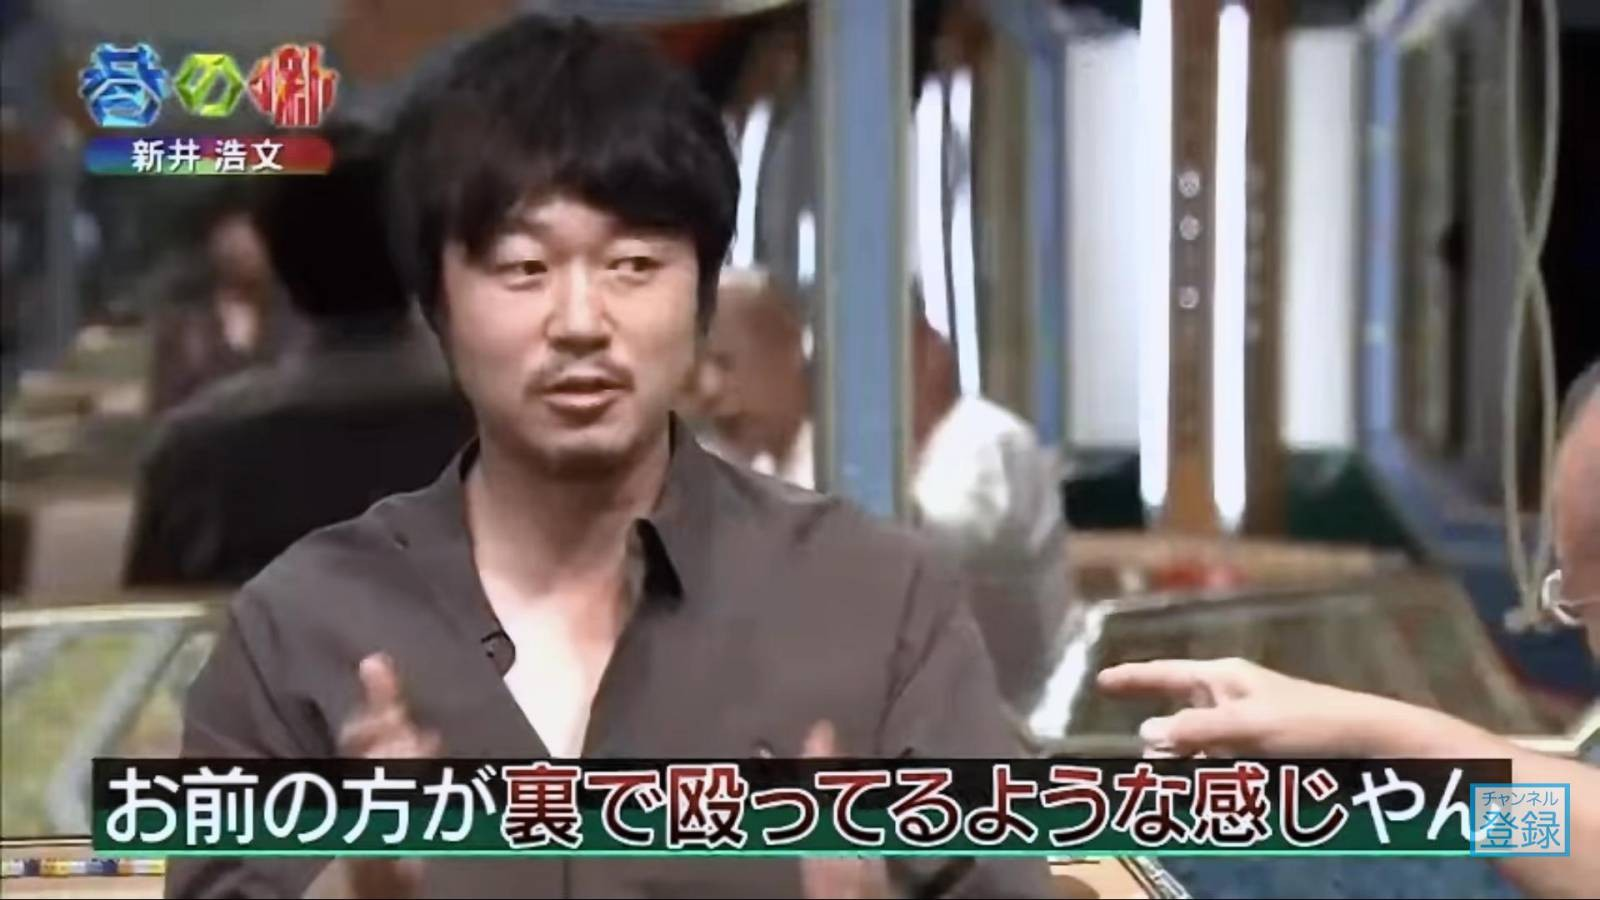 [Good news] I saw the nature of Tsurube bottle, Hirofumi Arai